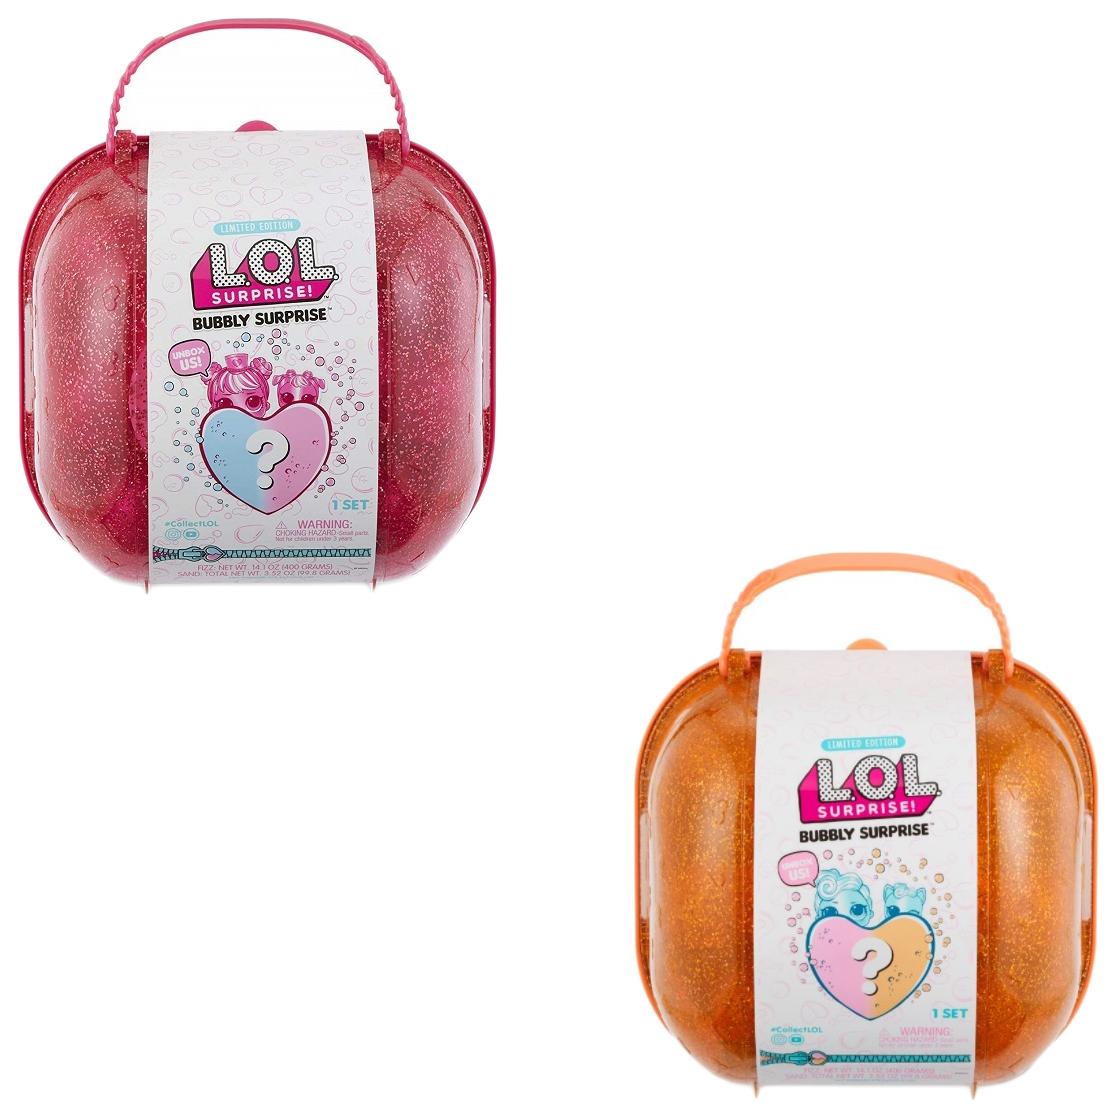 Купить Шипучий сюрприз LOL Surprise Bubbly - Кукла и питомец MGA Entertainment, Классические куклы